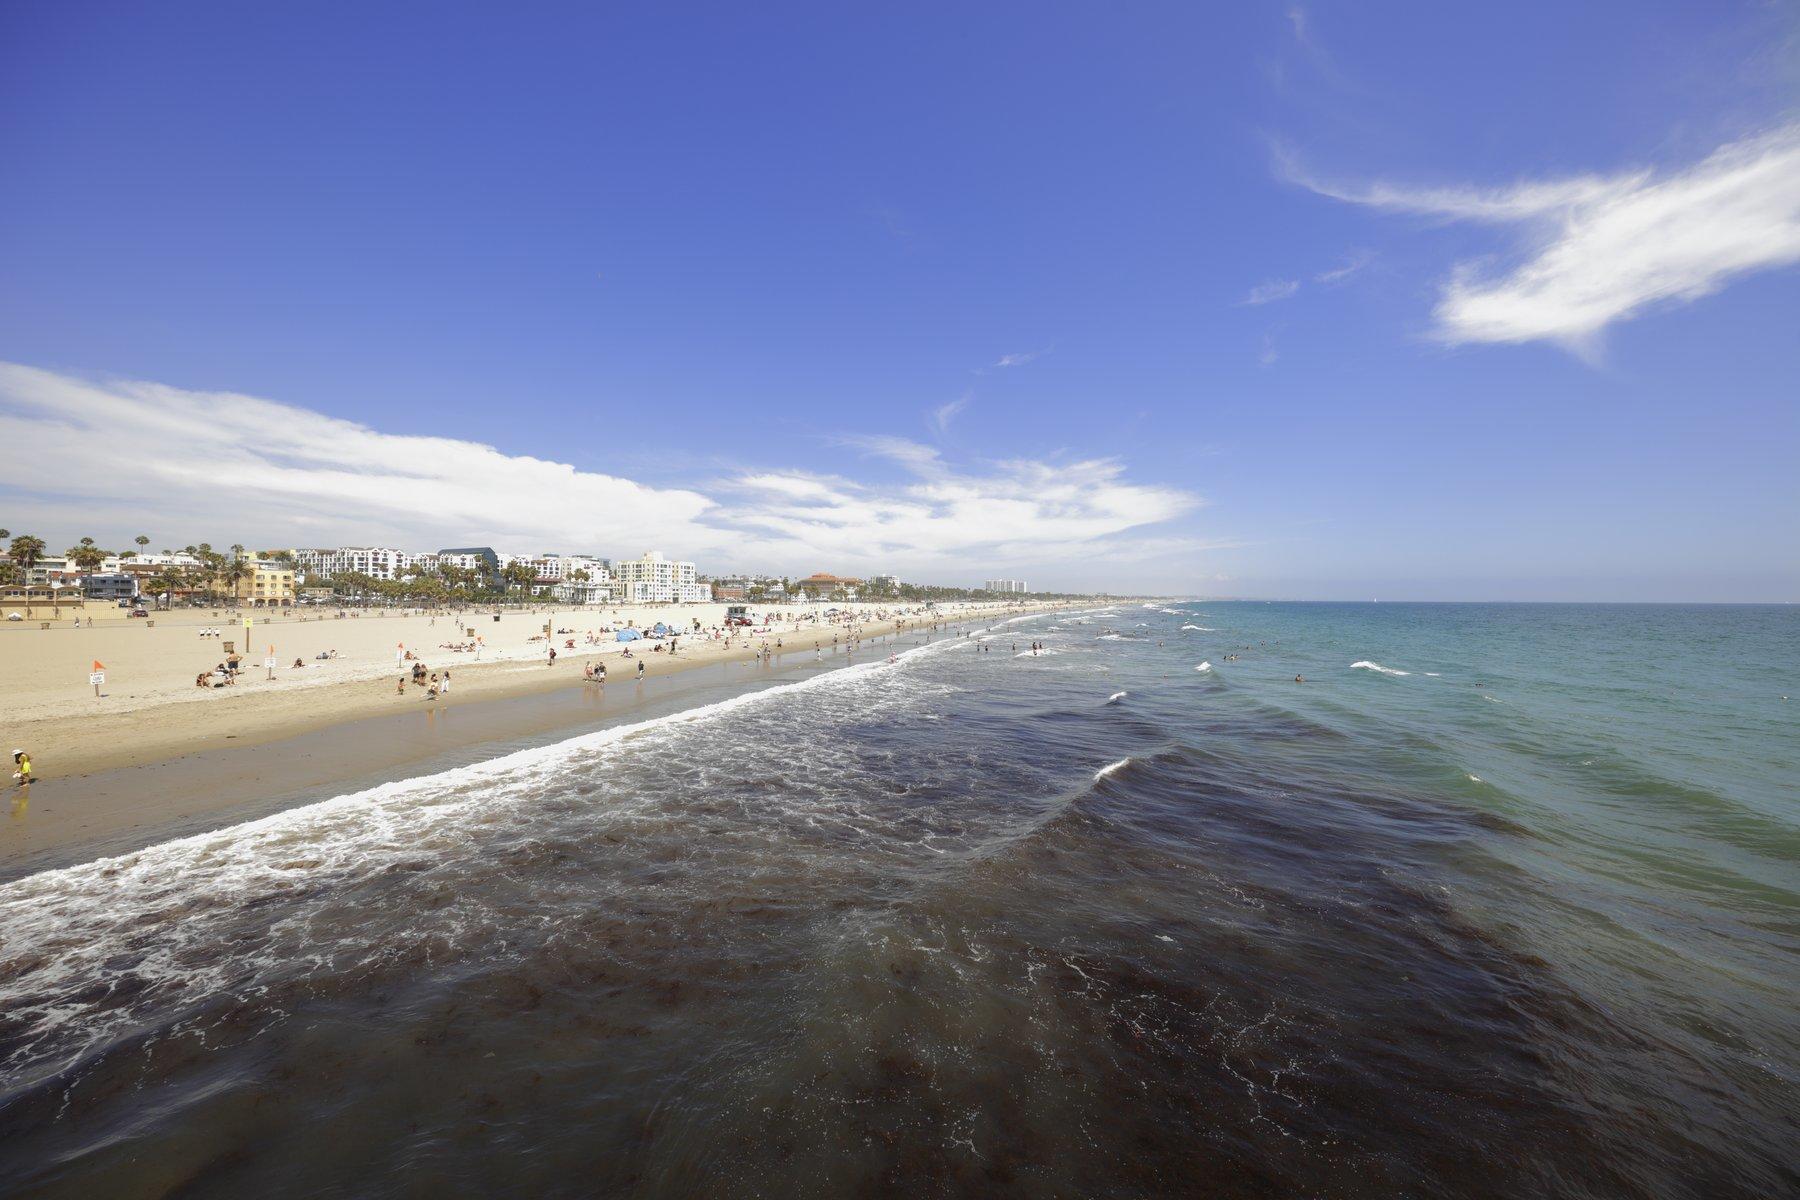 Wide photo of Santa Monica beach